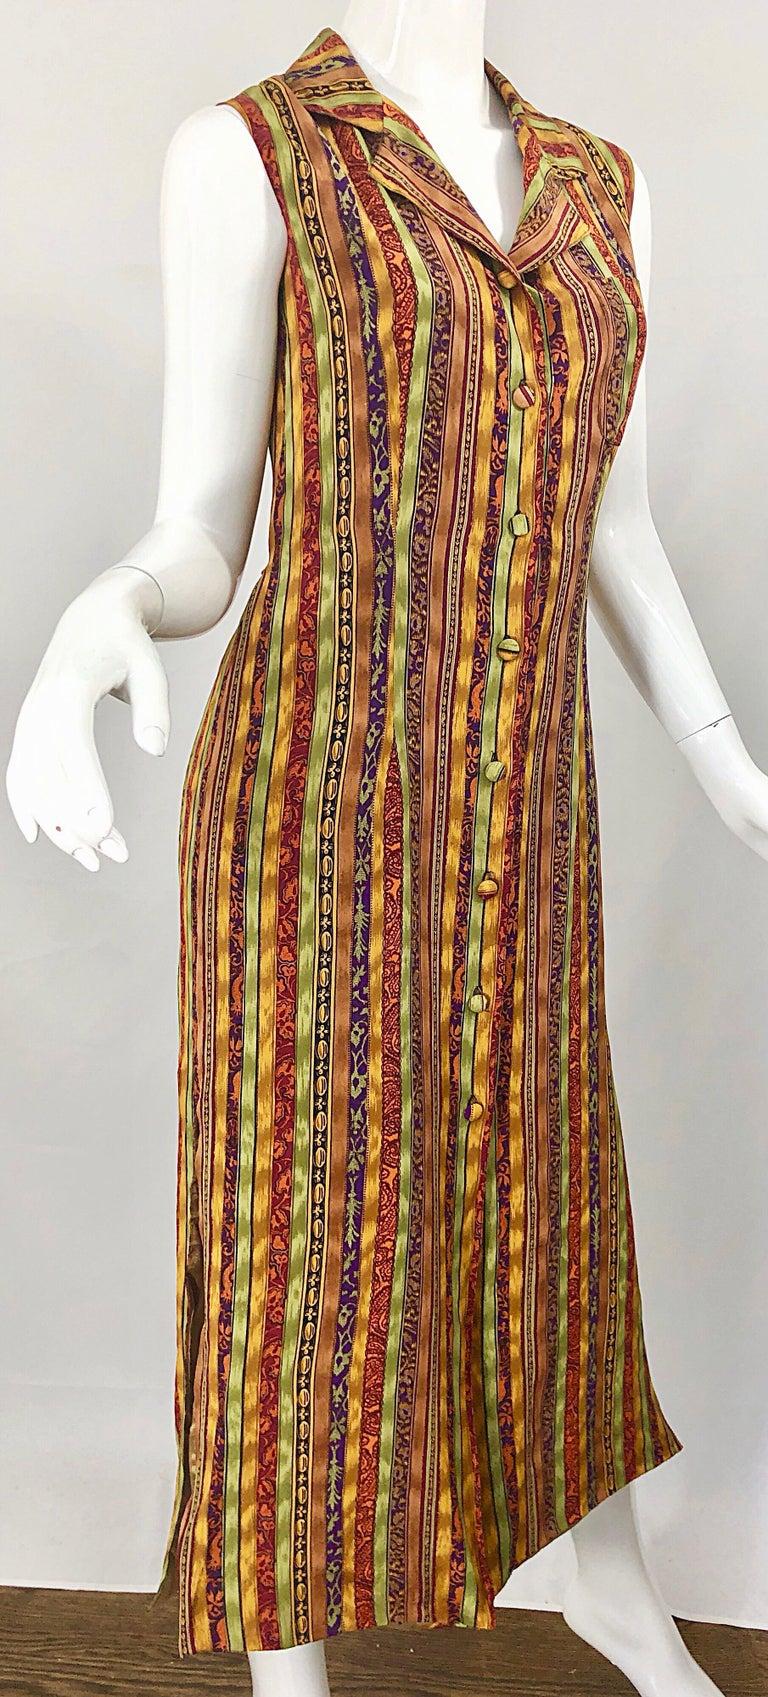 1990s Boho Silk Warm Color Vertical Aztec Stripe Sleeveless 90s Midi Shirt Dress For Sale 6